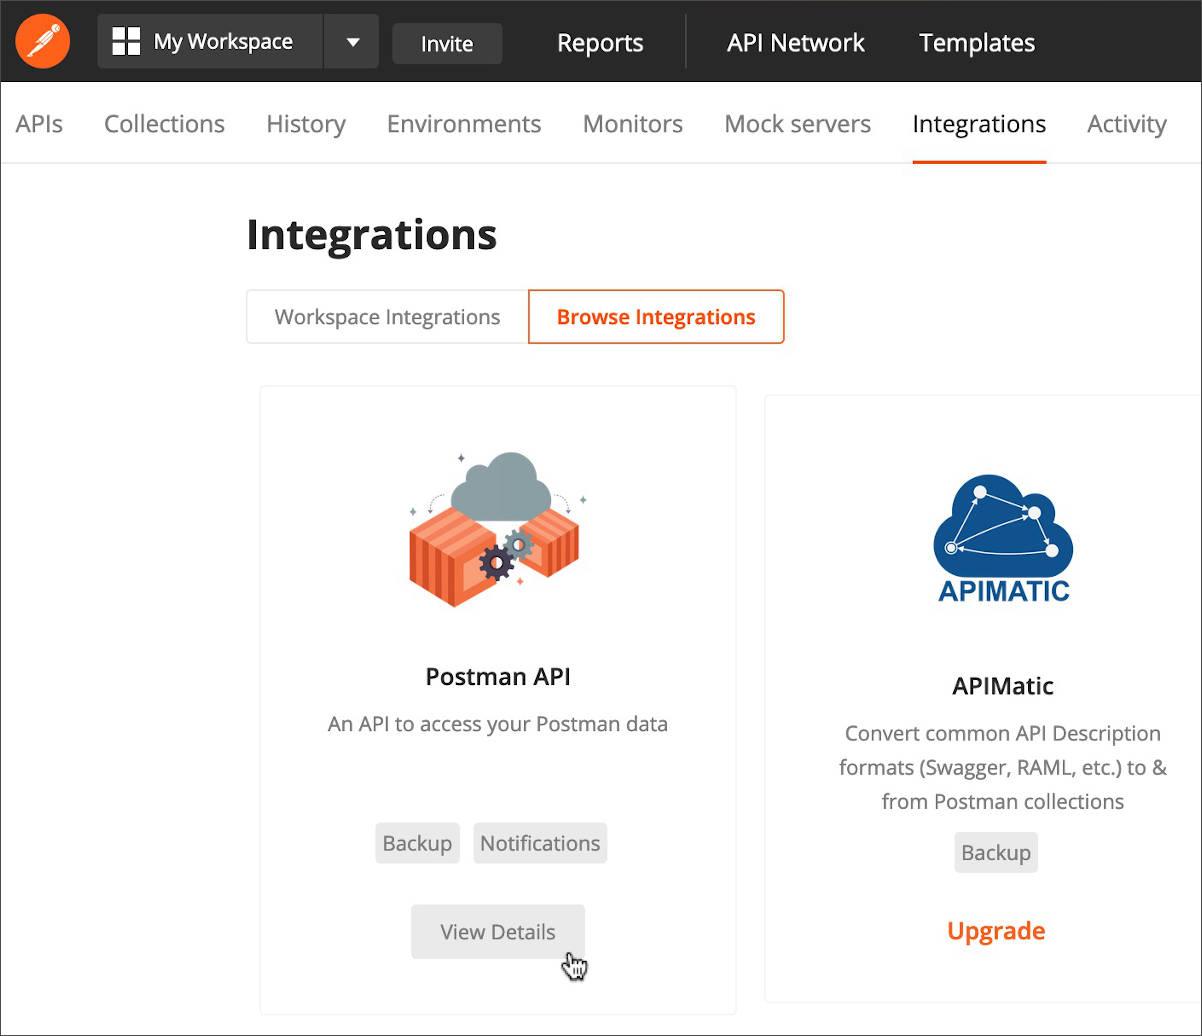 Workspace Integrations